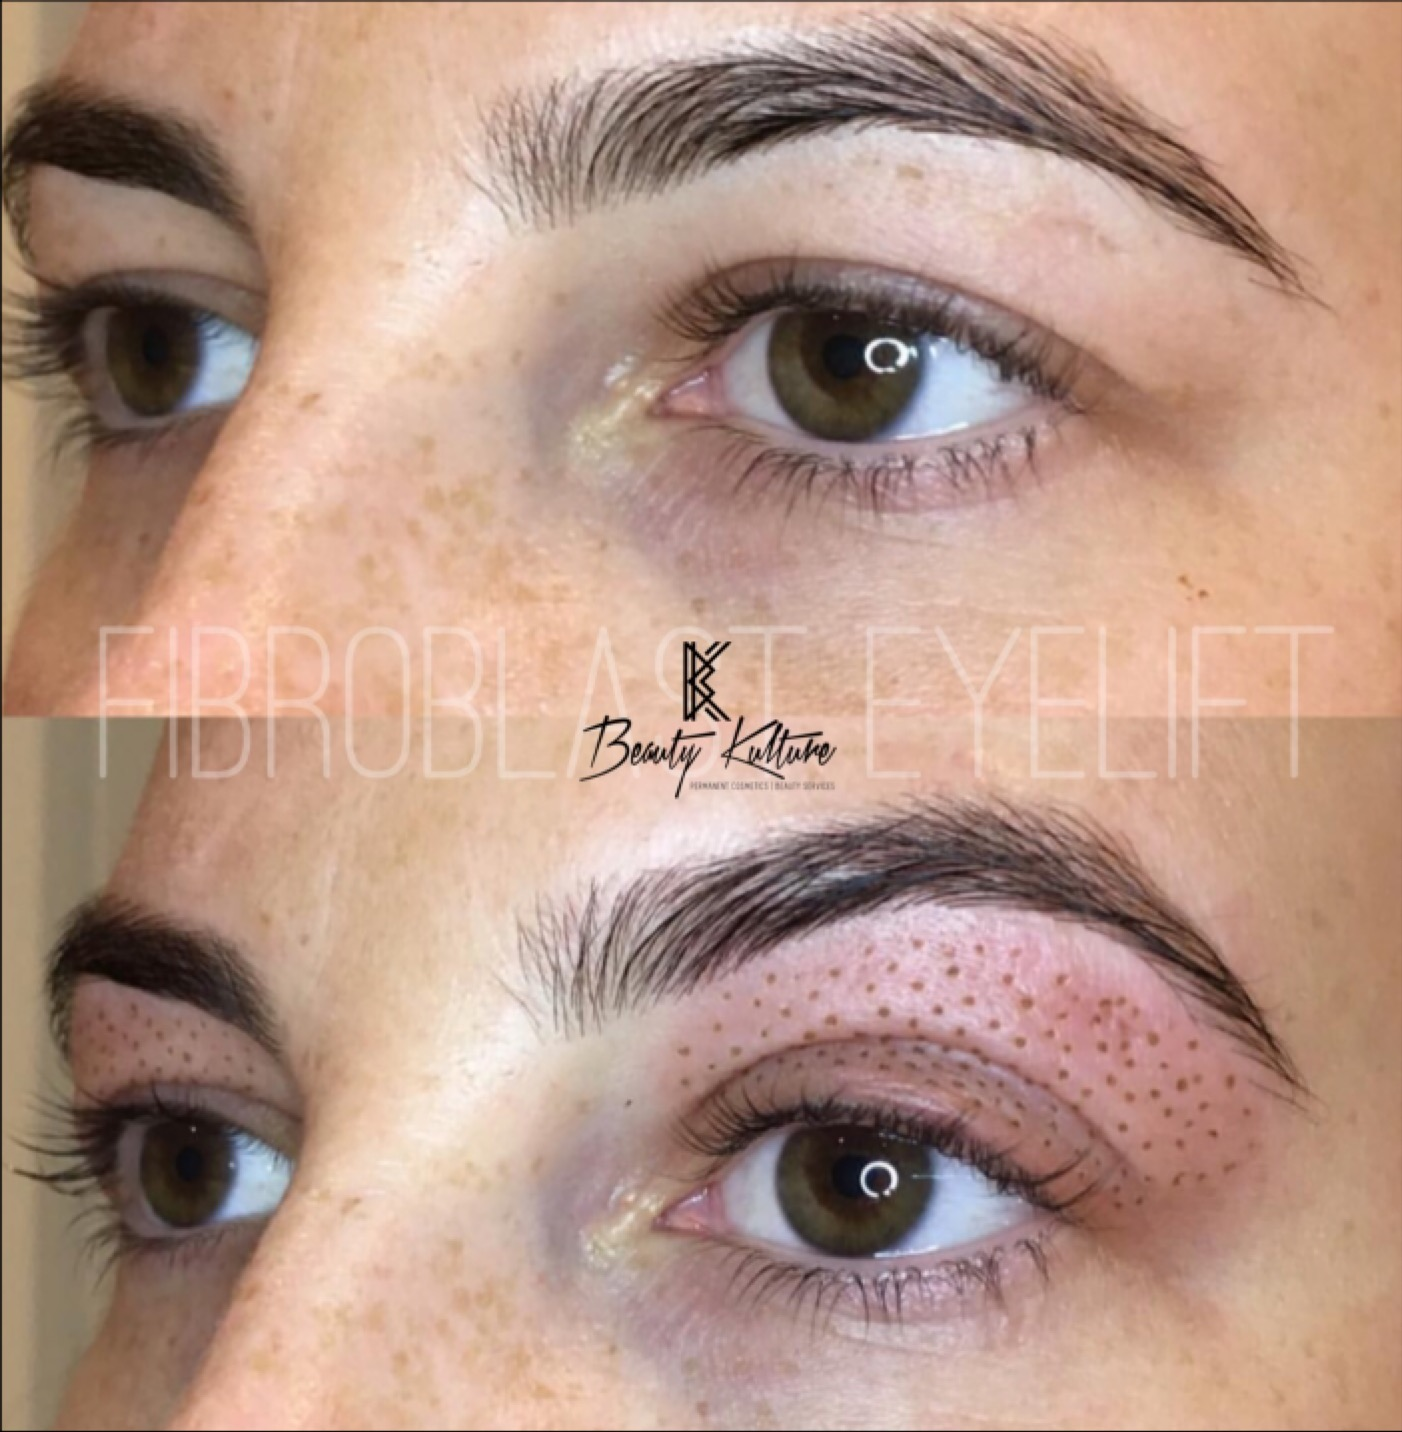 Eyelid Lift with Plasma Fibroblast/Firbrolift